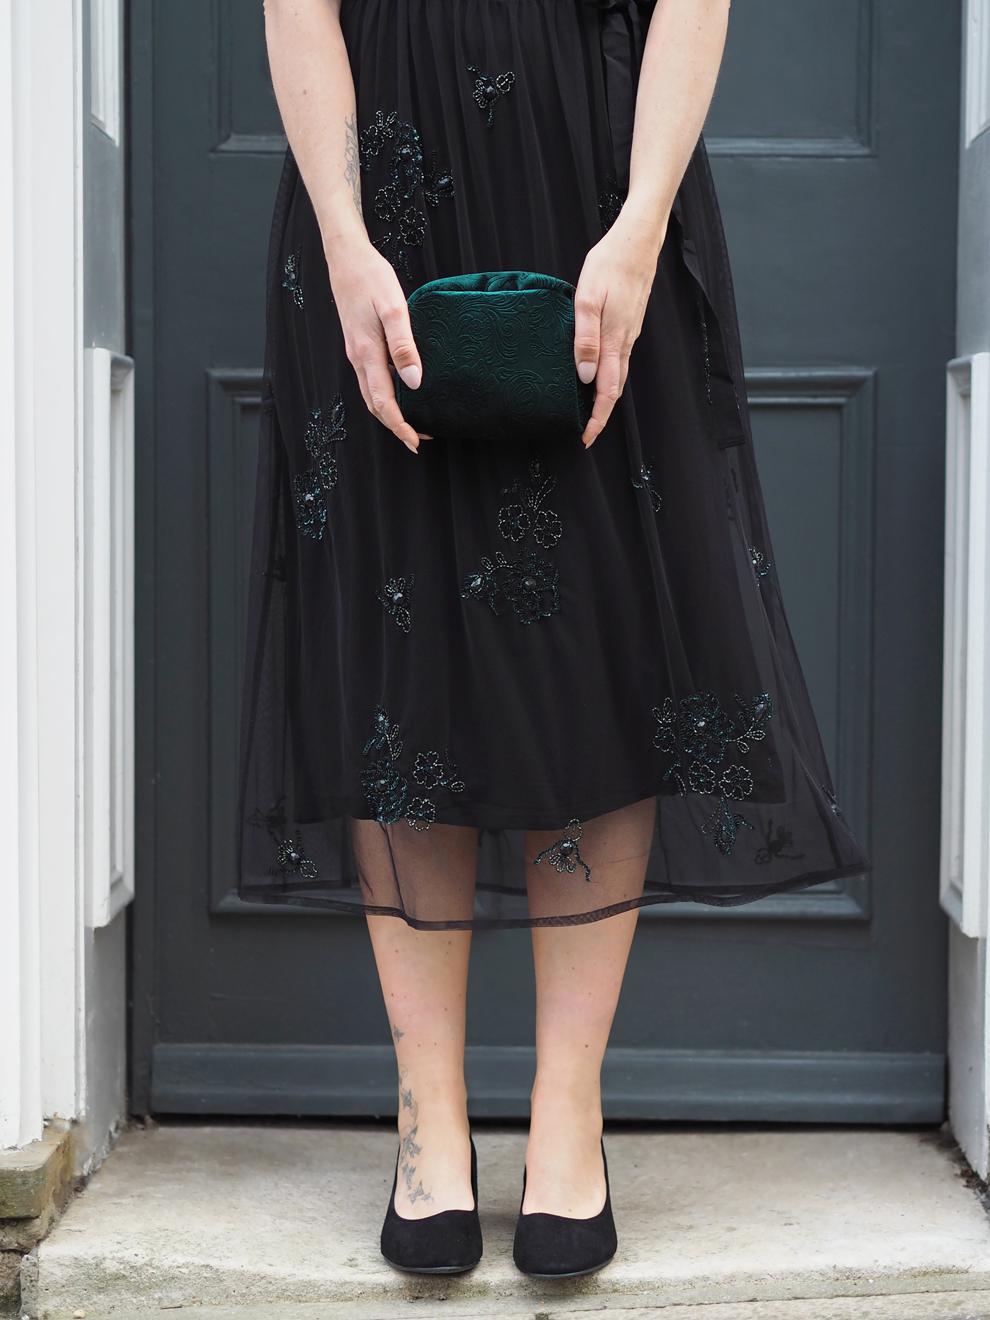 Bang On Style Emerald Dress